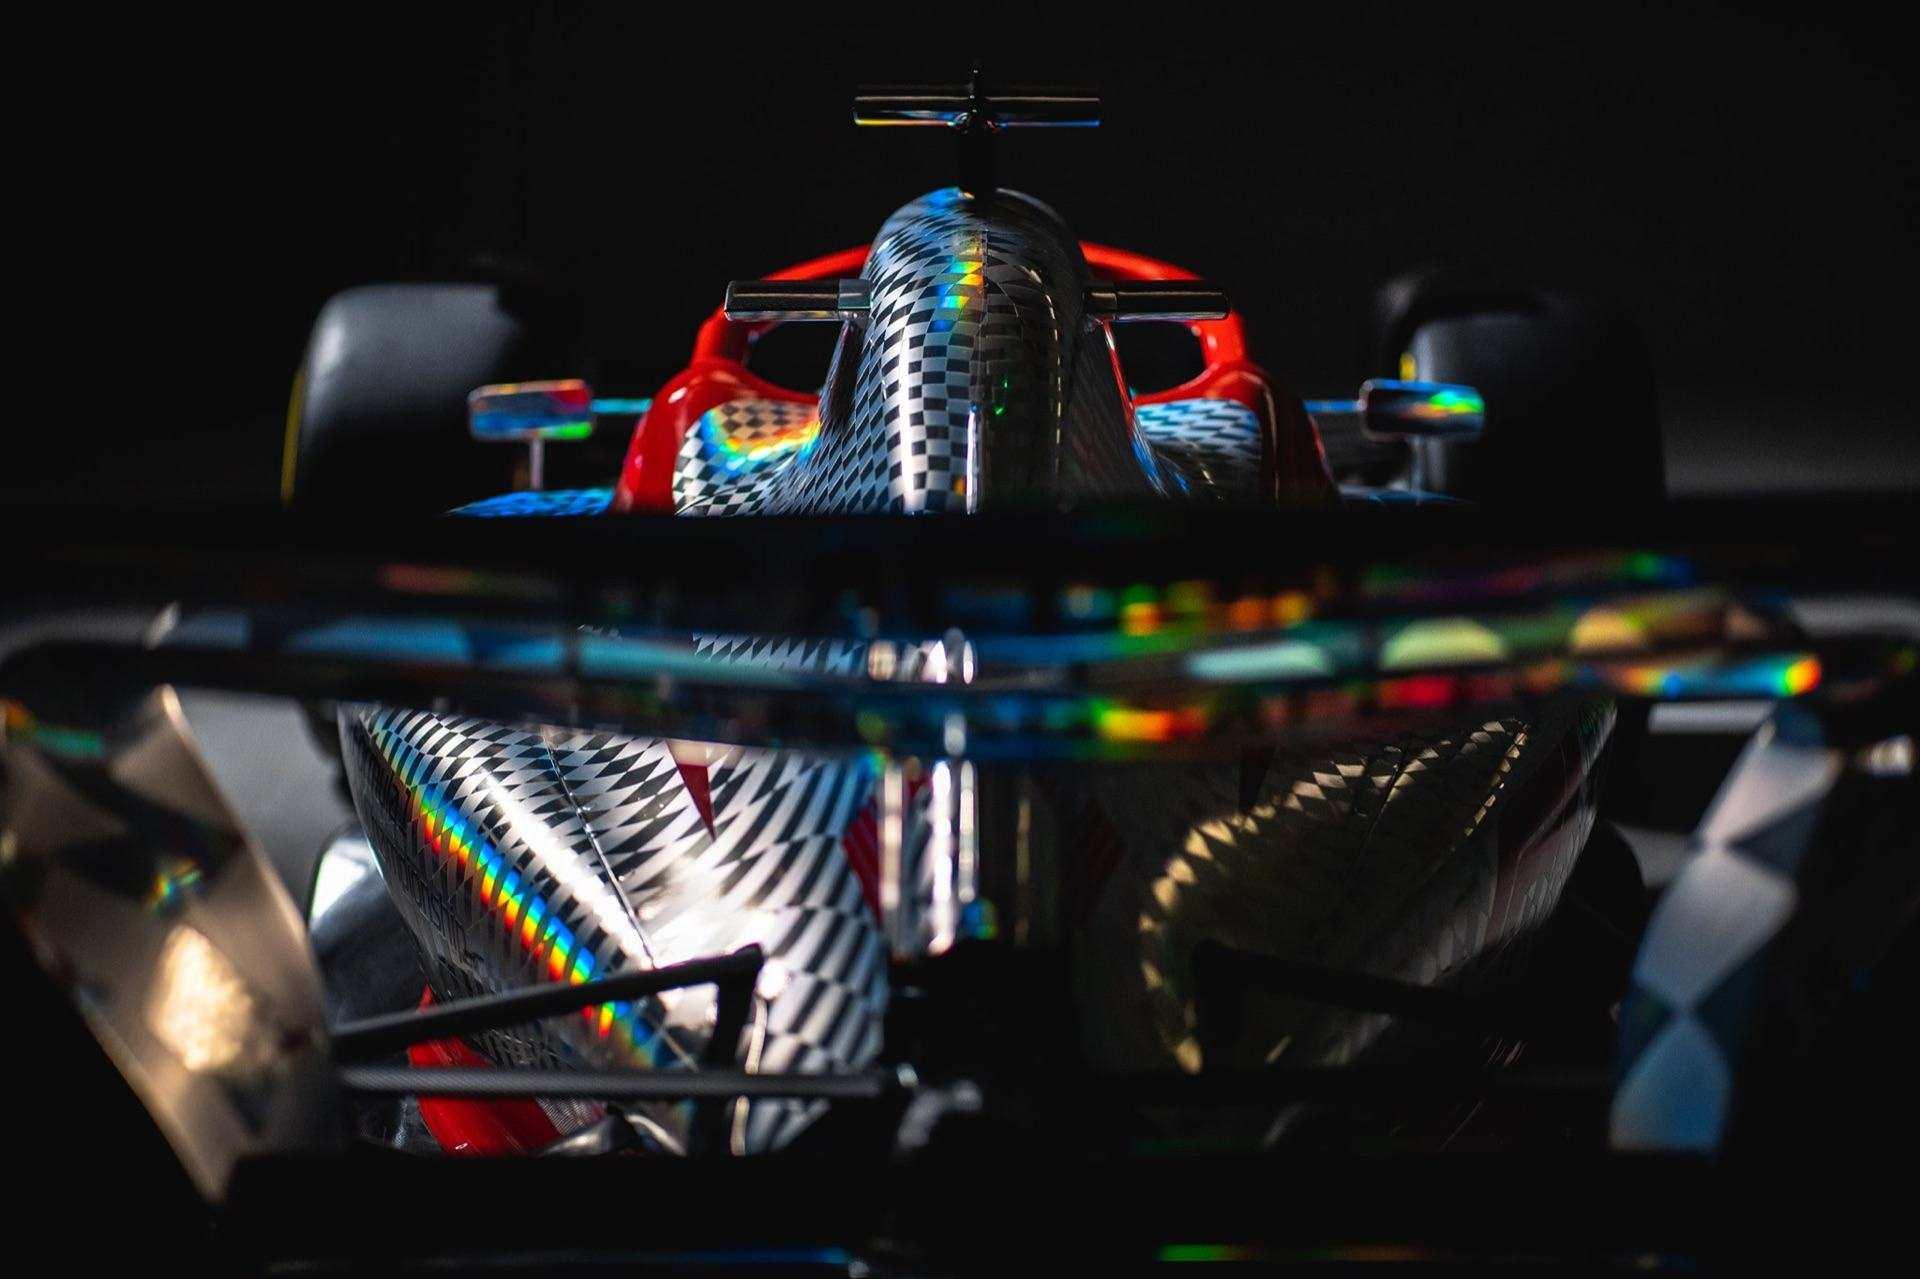 F1-Formula-1-car-2022-9_1920x1279